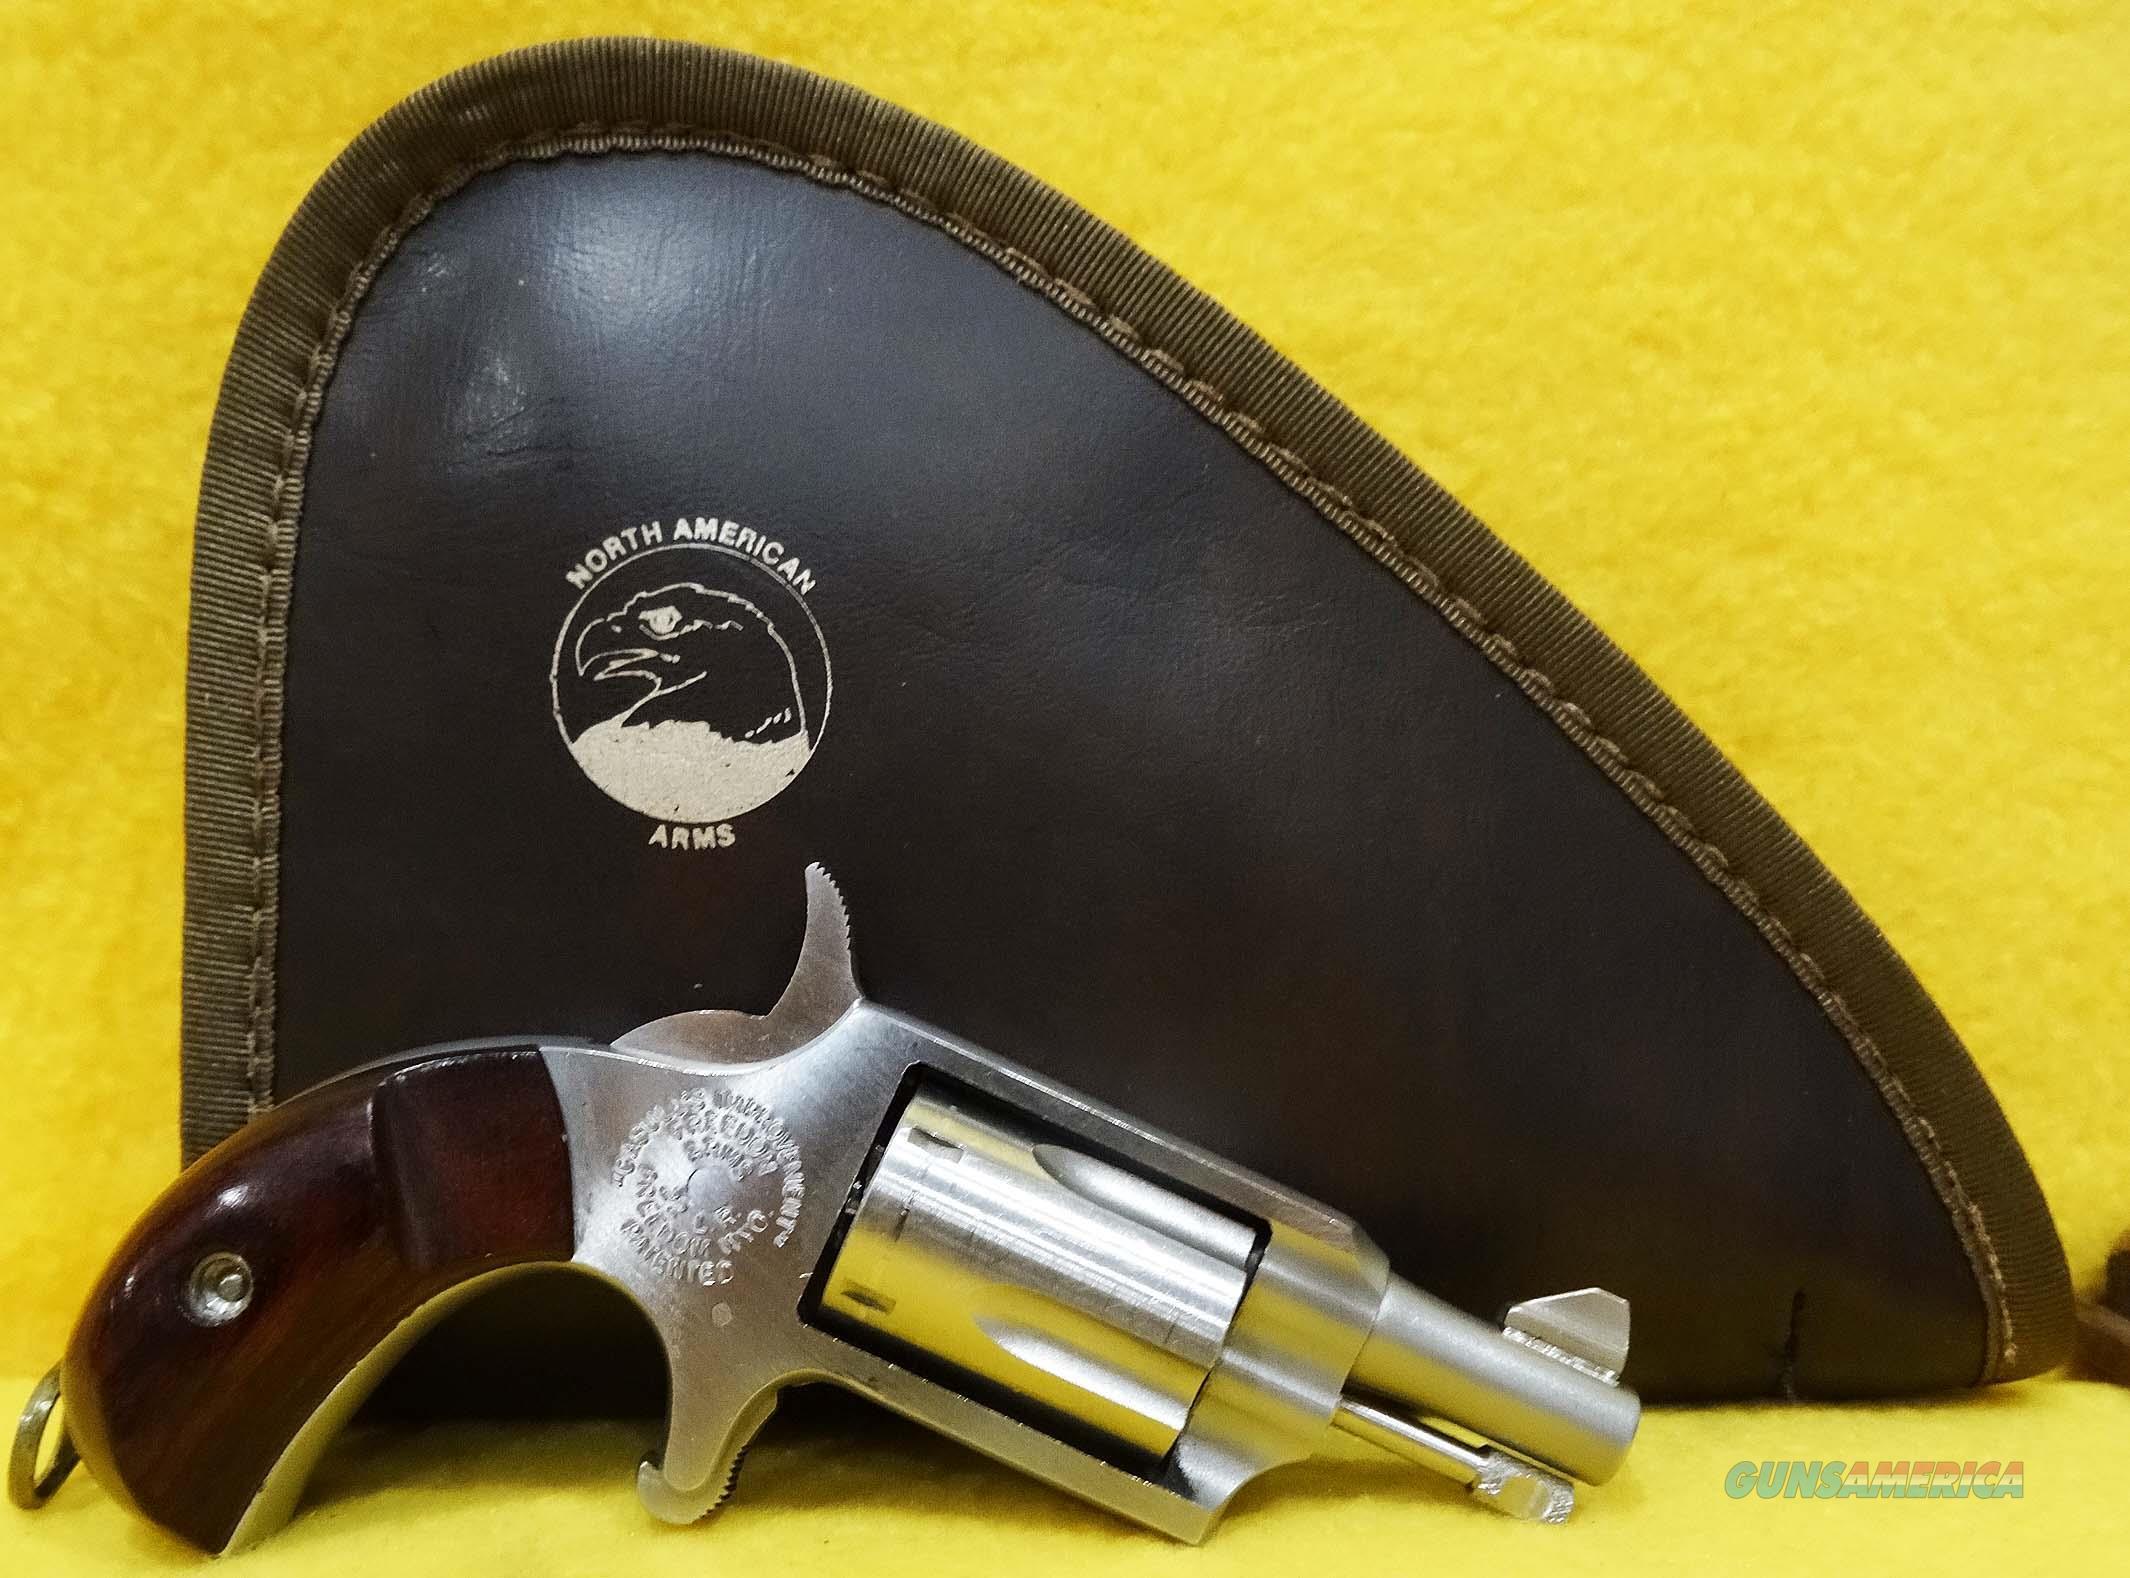 FREEDOM ARMS (CASULL) MINI  Guns > Pistols > Freedom Arms Pistols